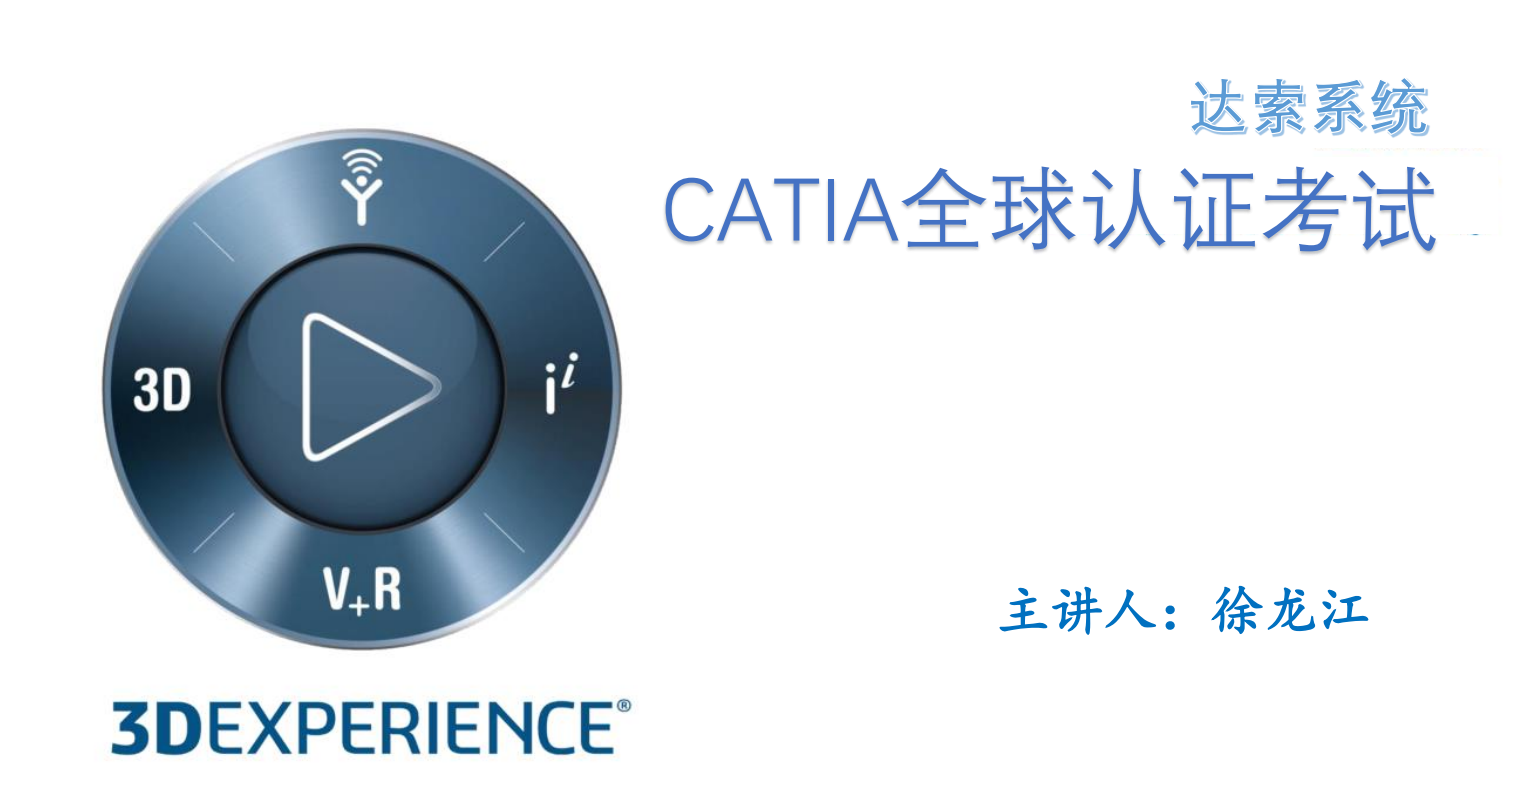 CATIA全球认证考试说明视频